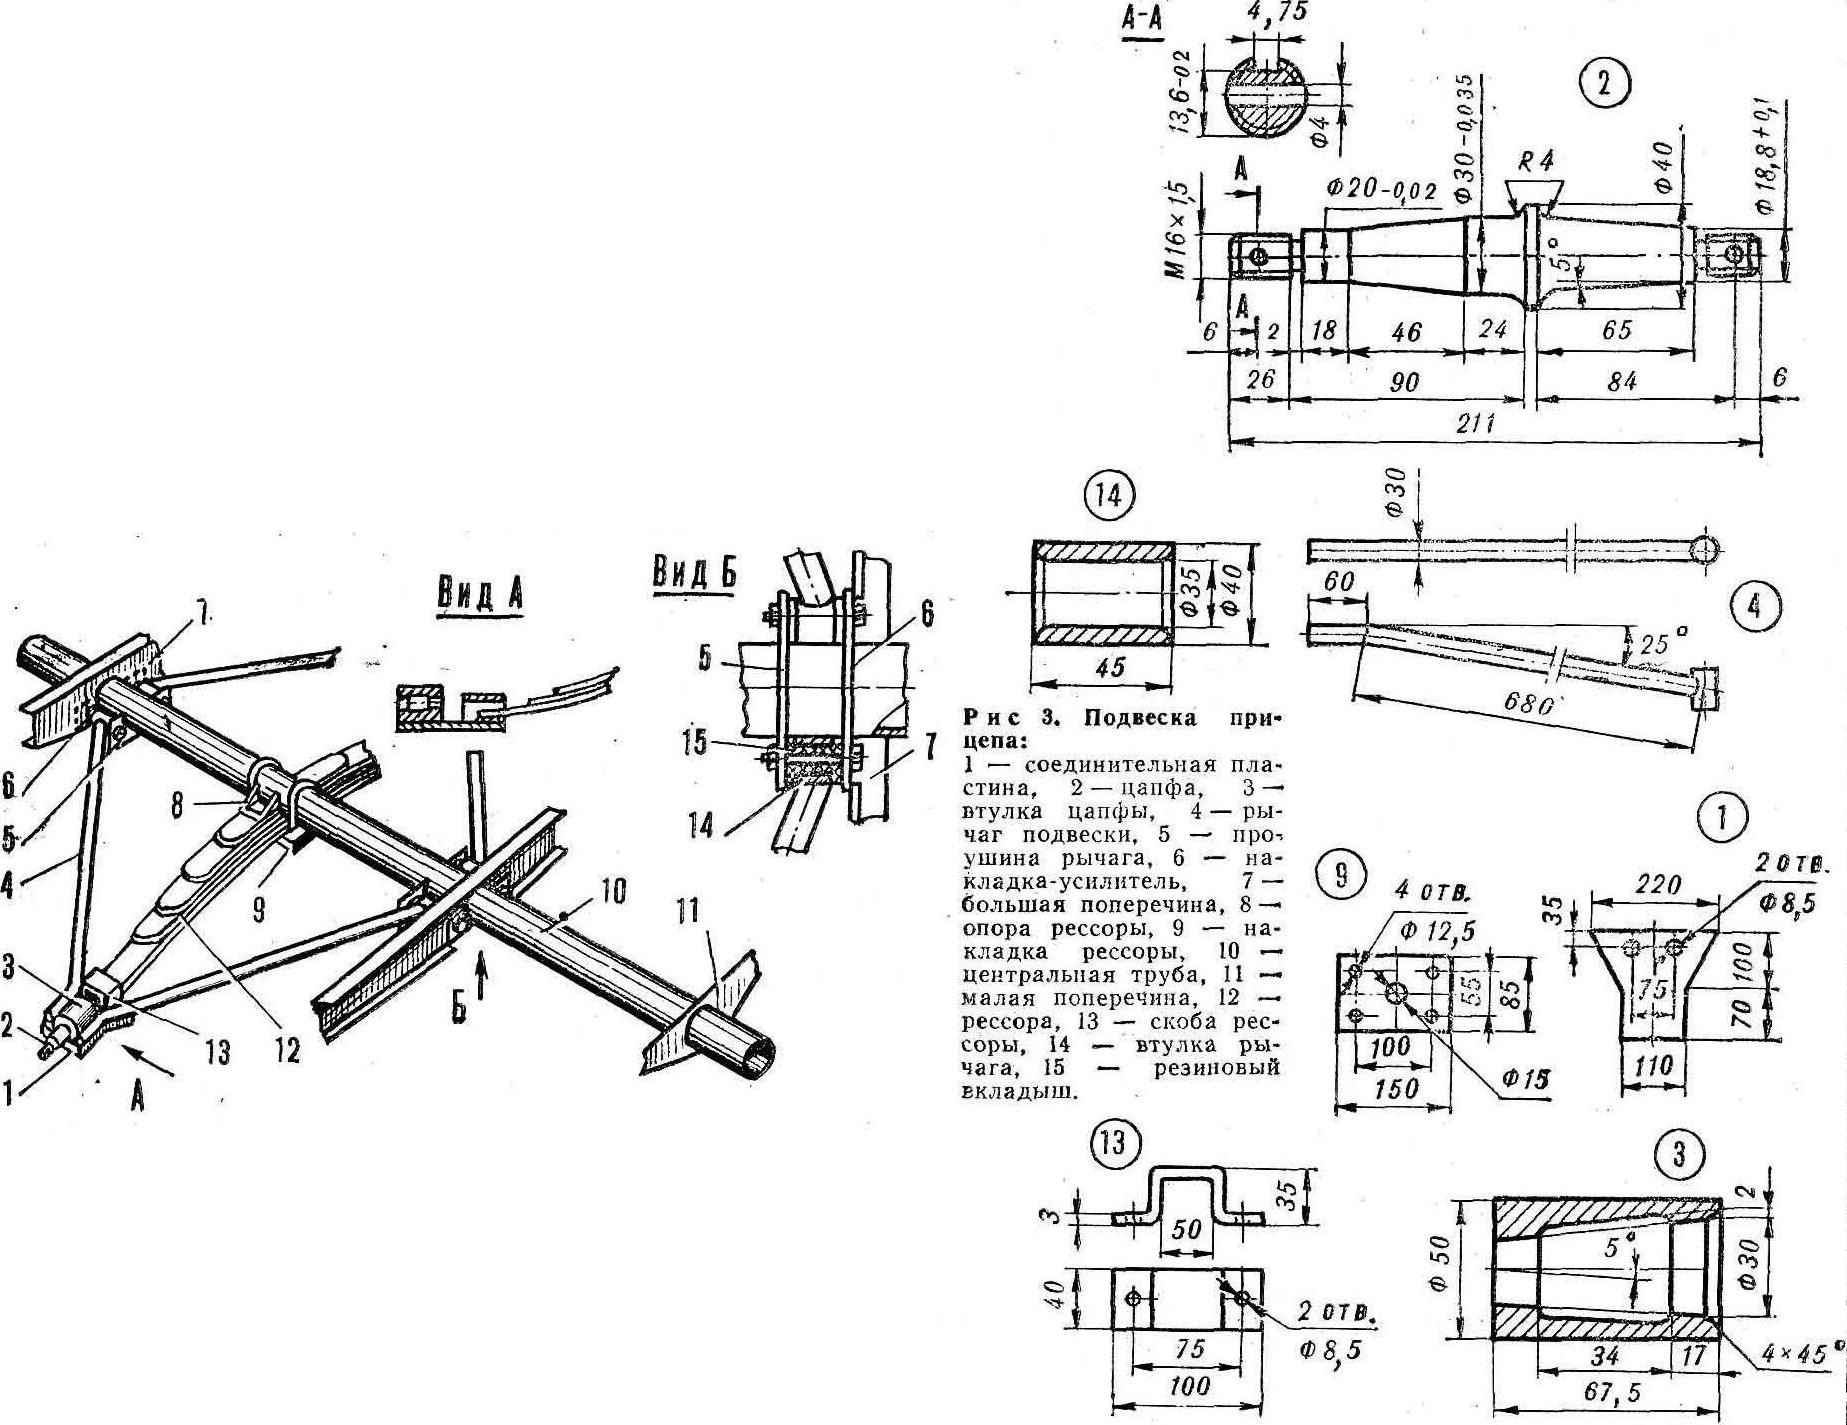 Figure 3. The trailer suspension